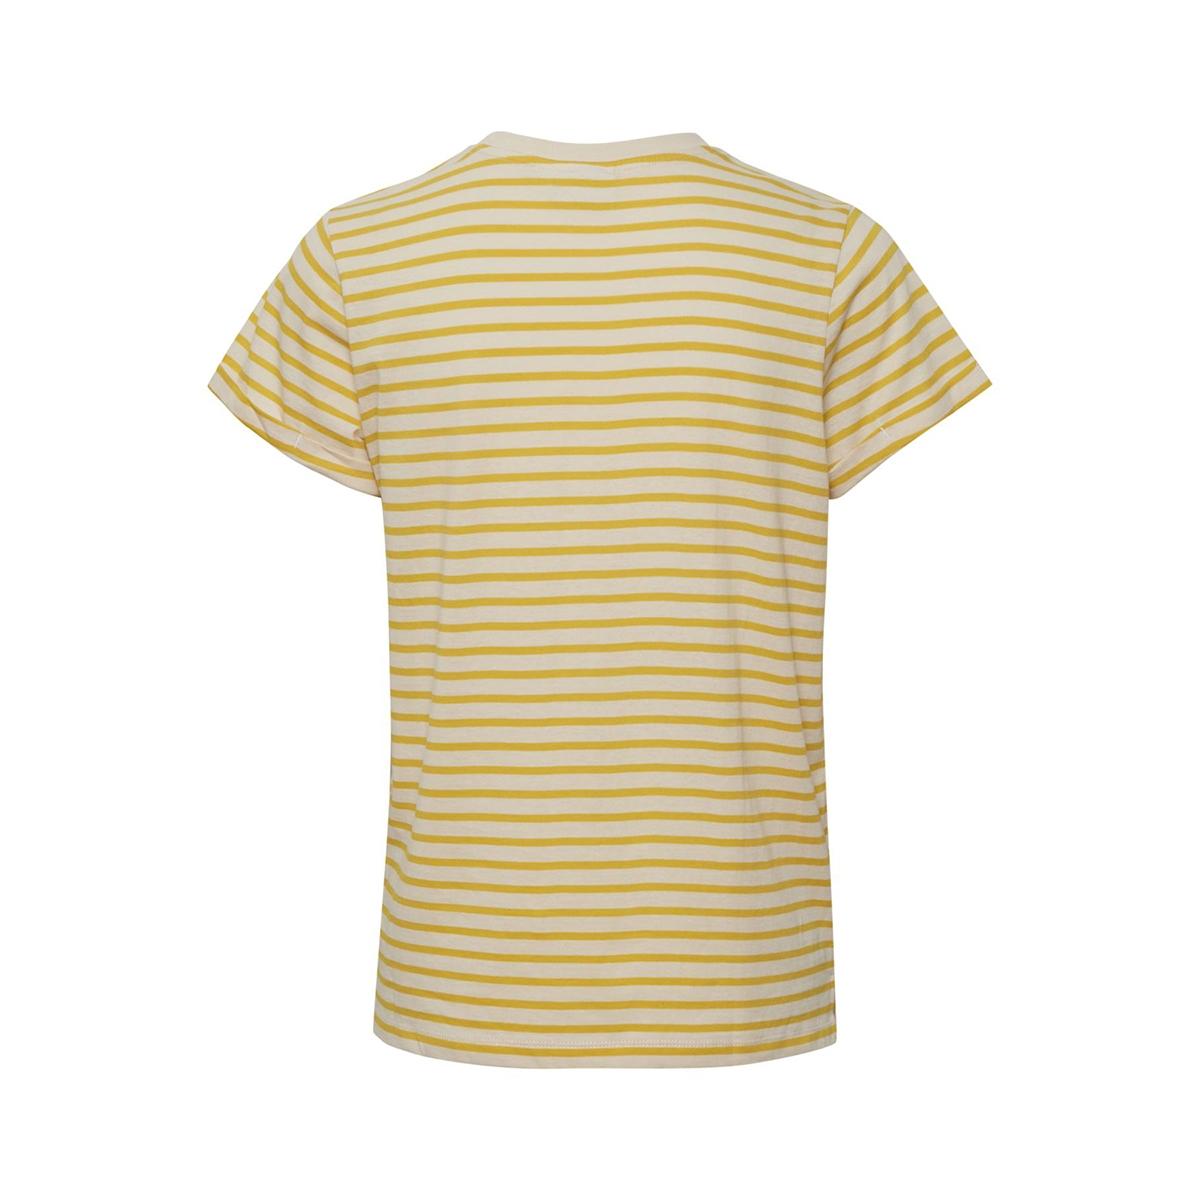 florasz top 30510196 saint tropez t-shirt 131308